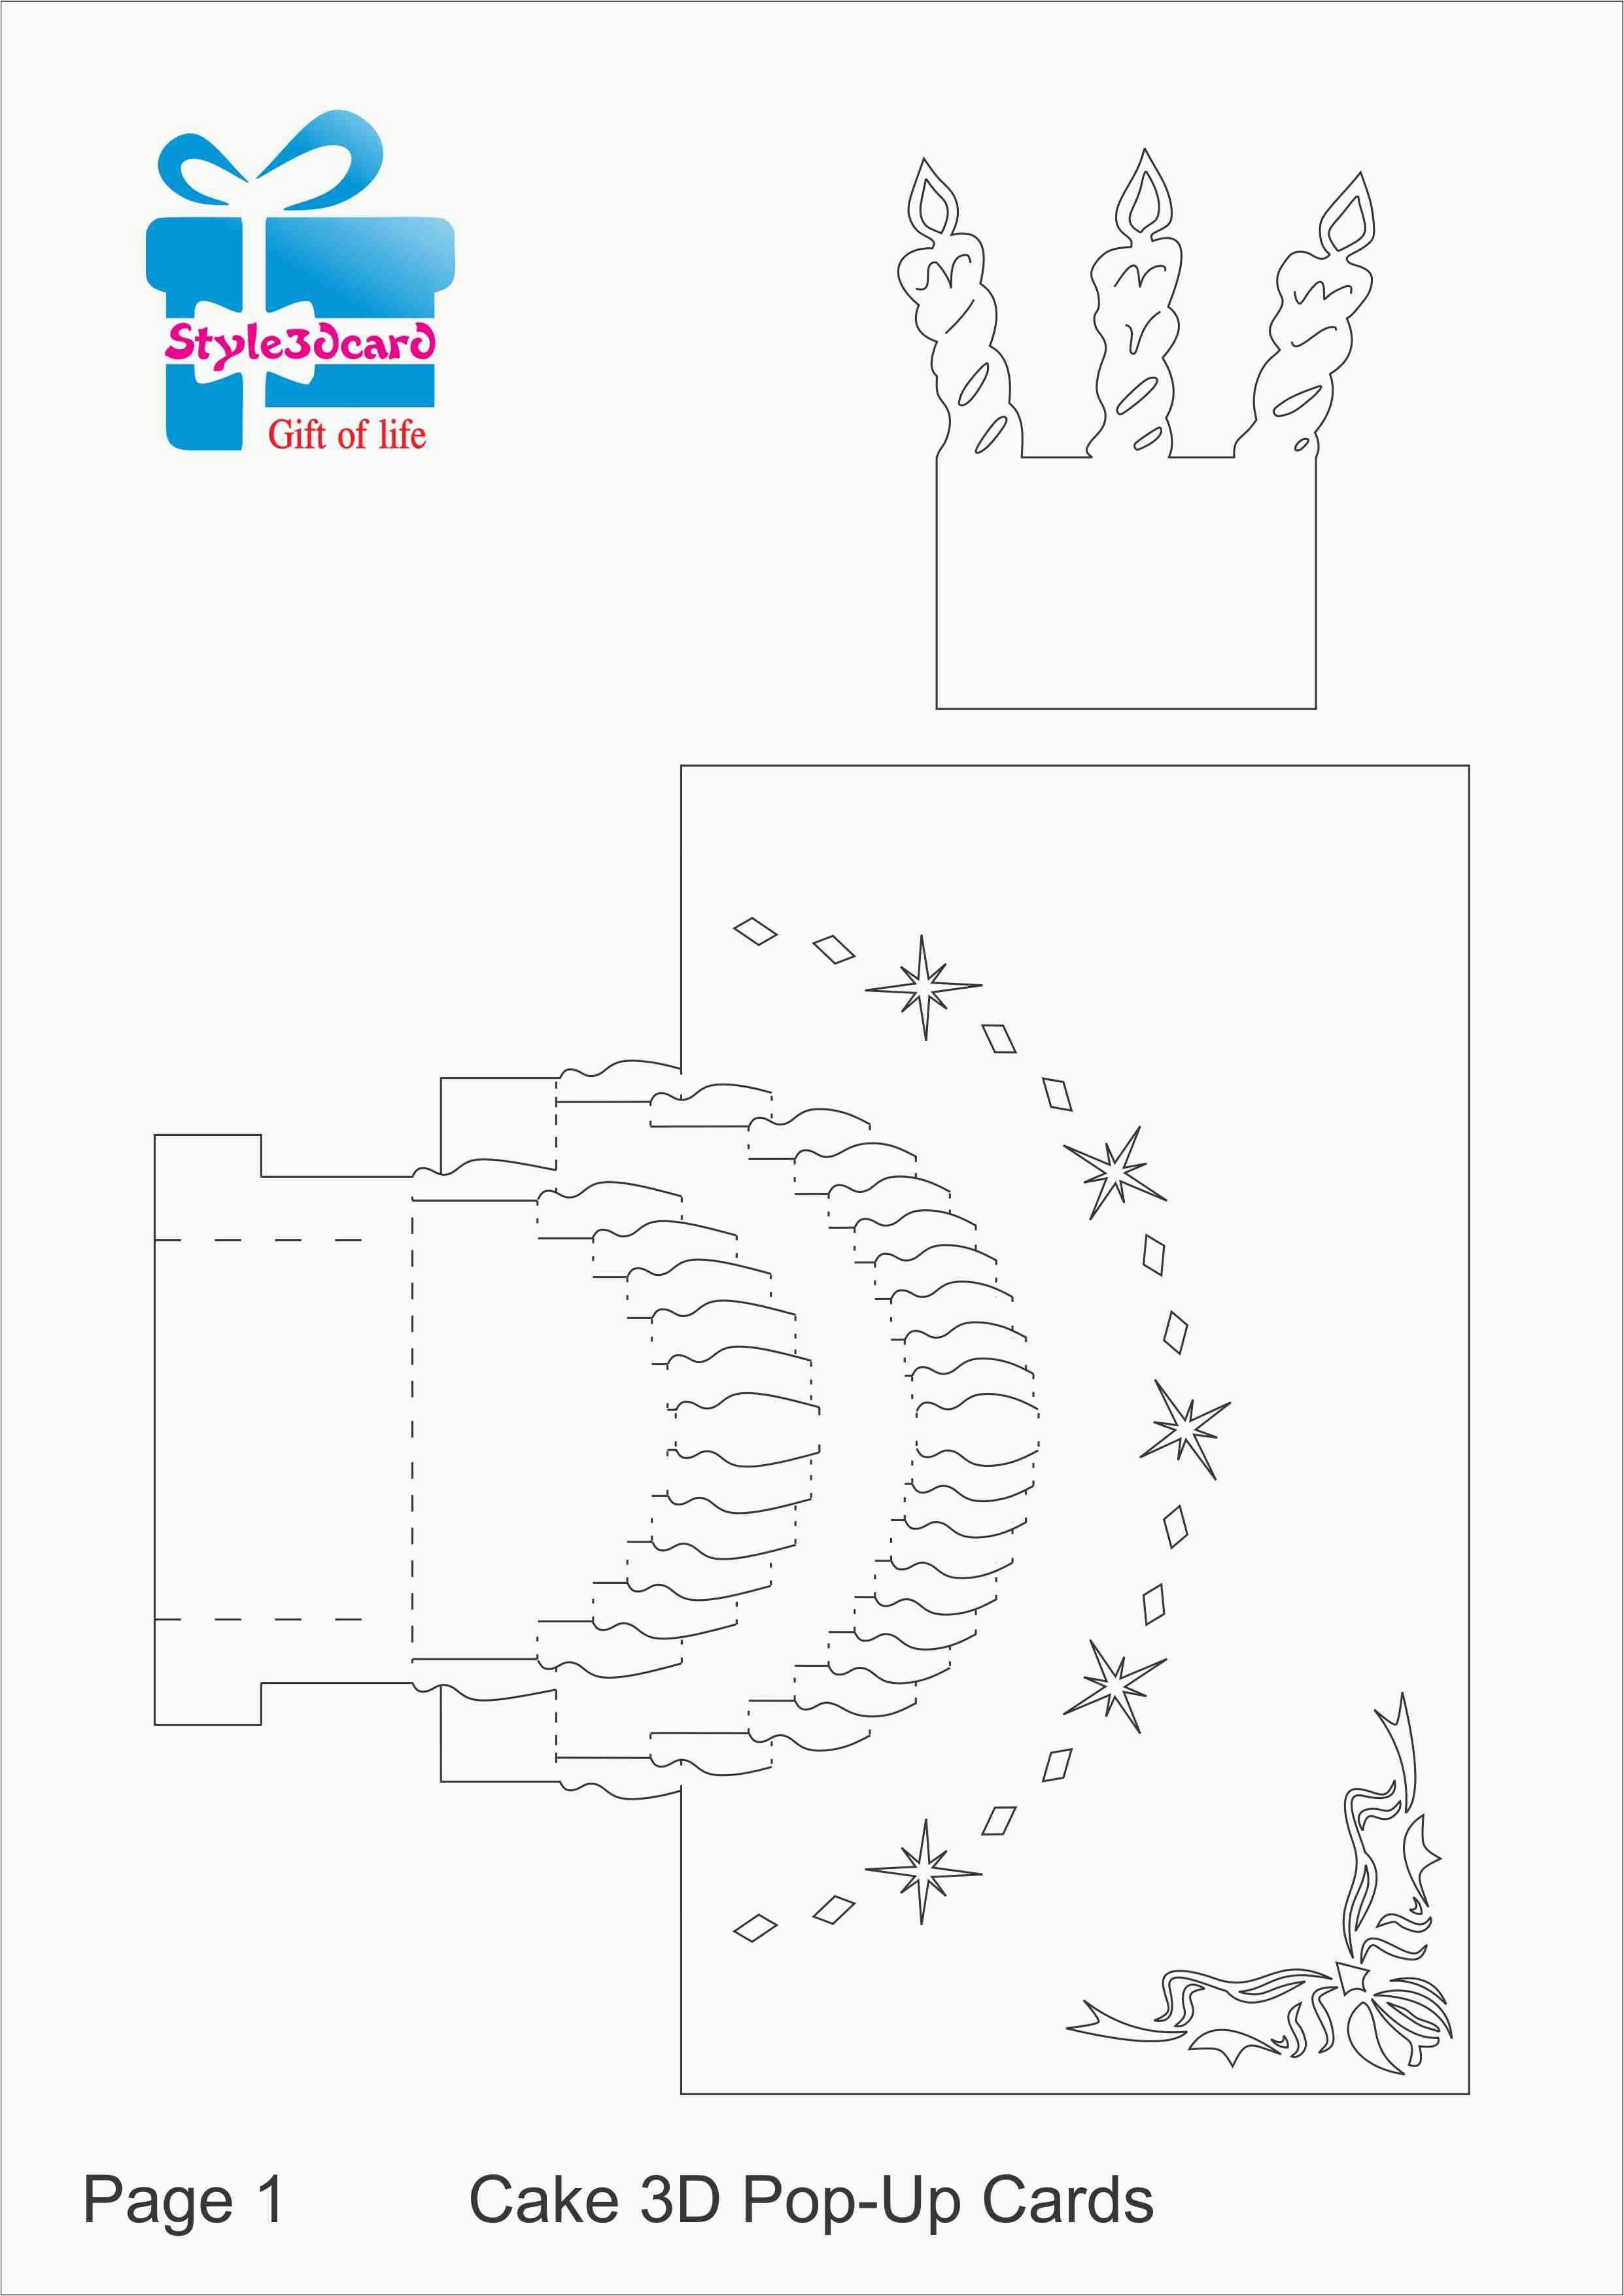 Diy Pop Up Birthday Cards Template | 911Stories - Free Printable Kirigami Pop Up Card Patterns